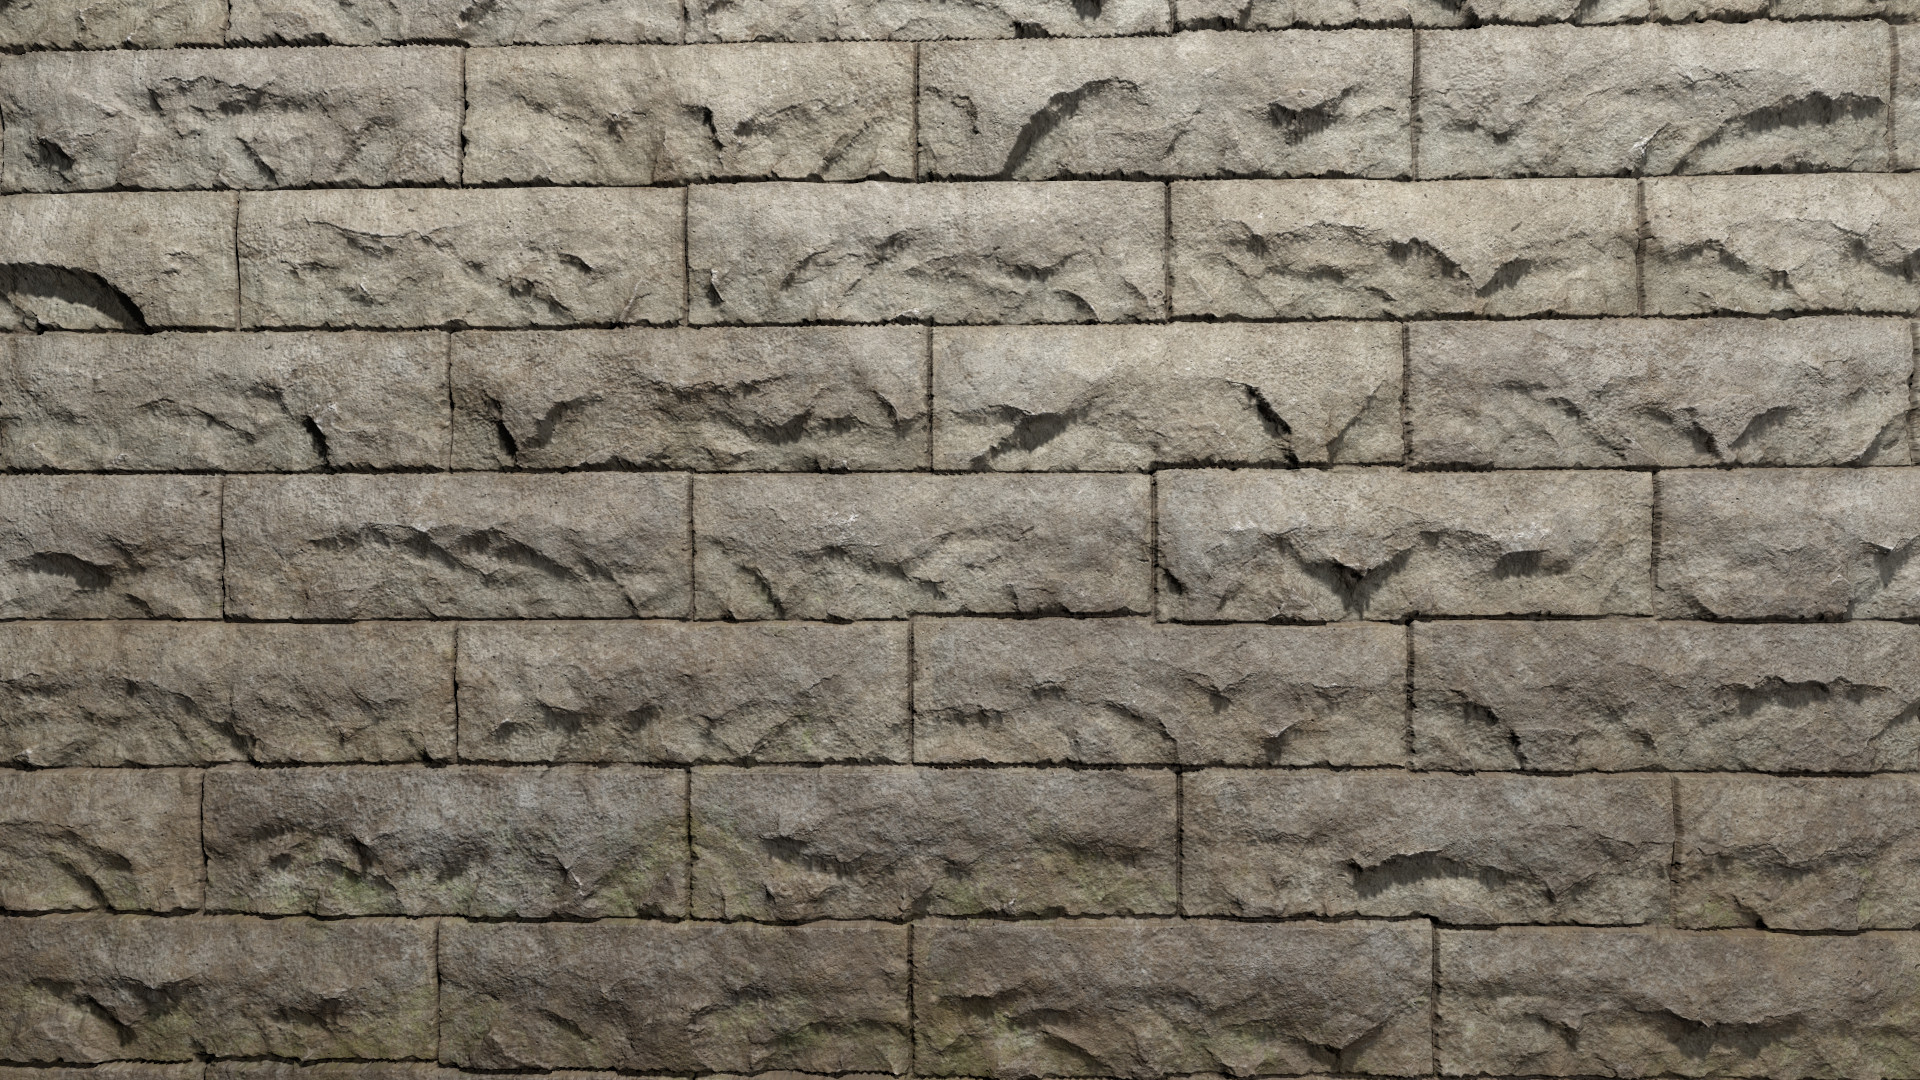 Kurt kupser textures 0003s 0001 stone hewn 2